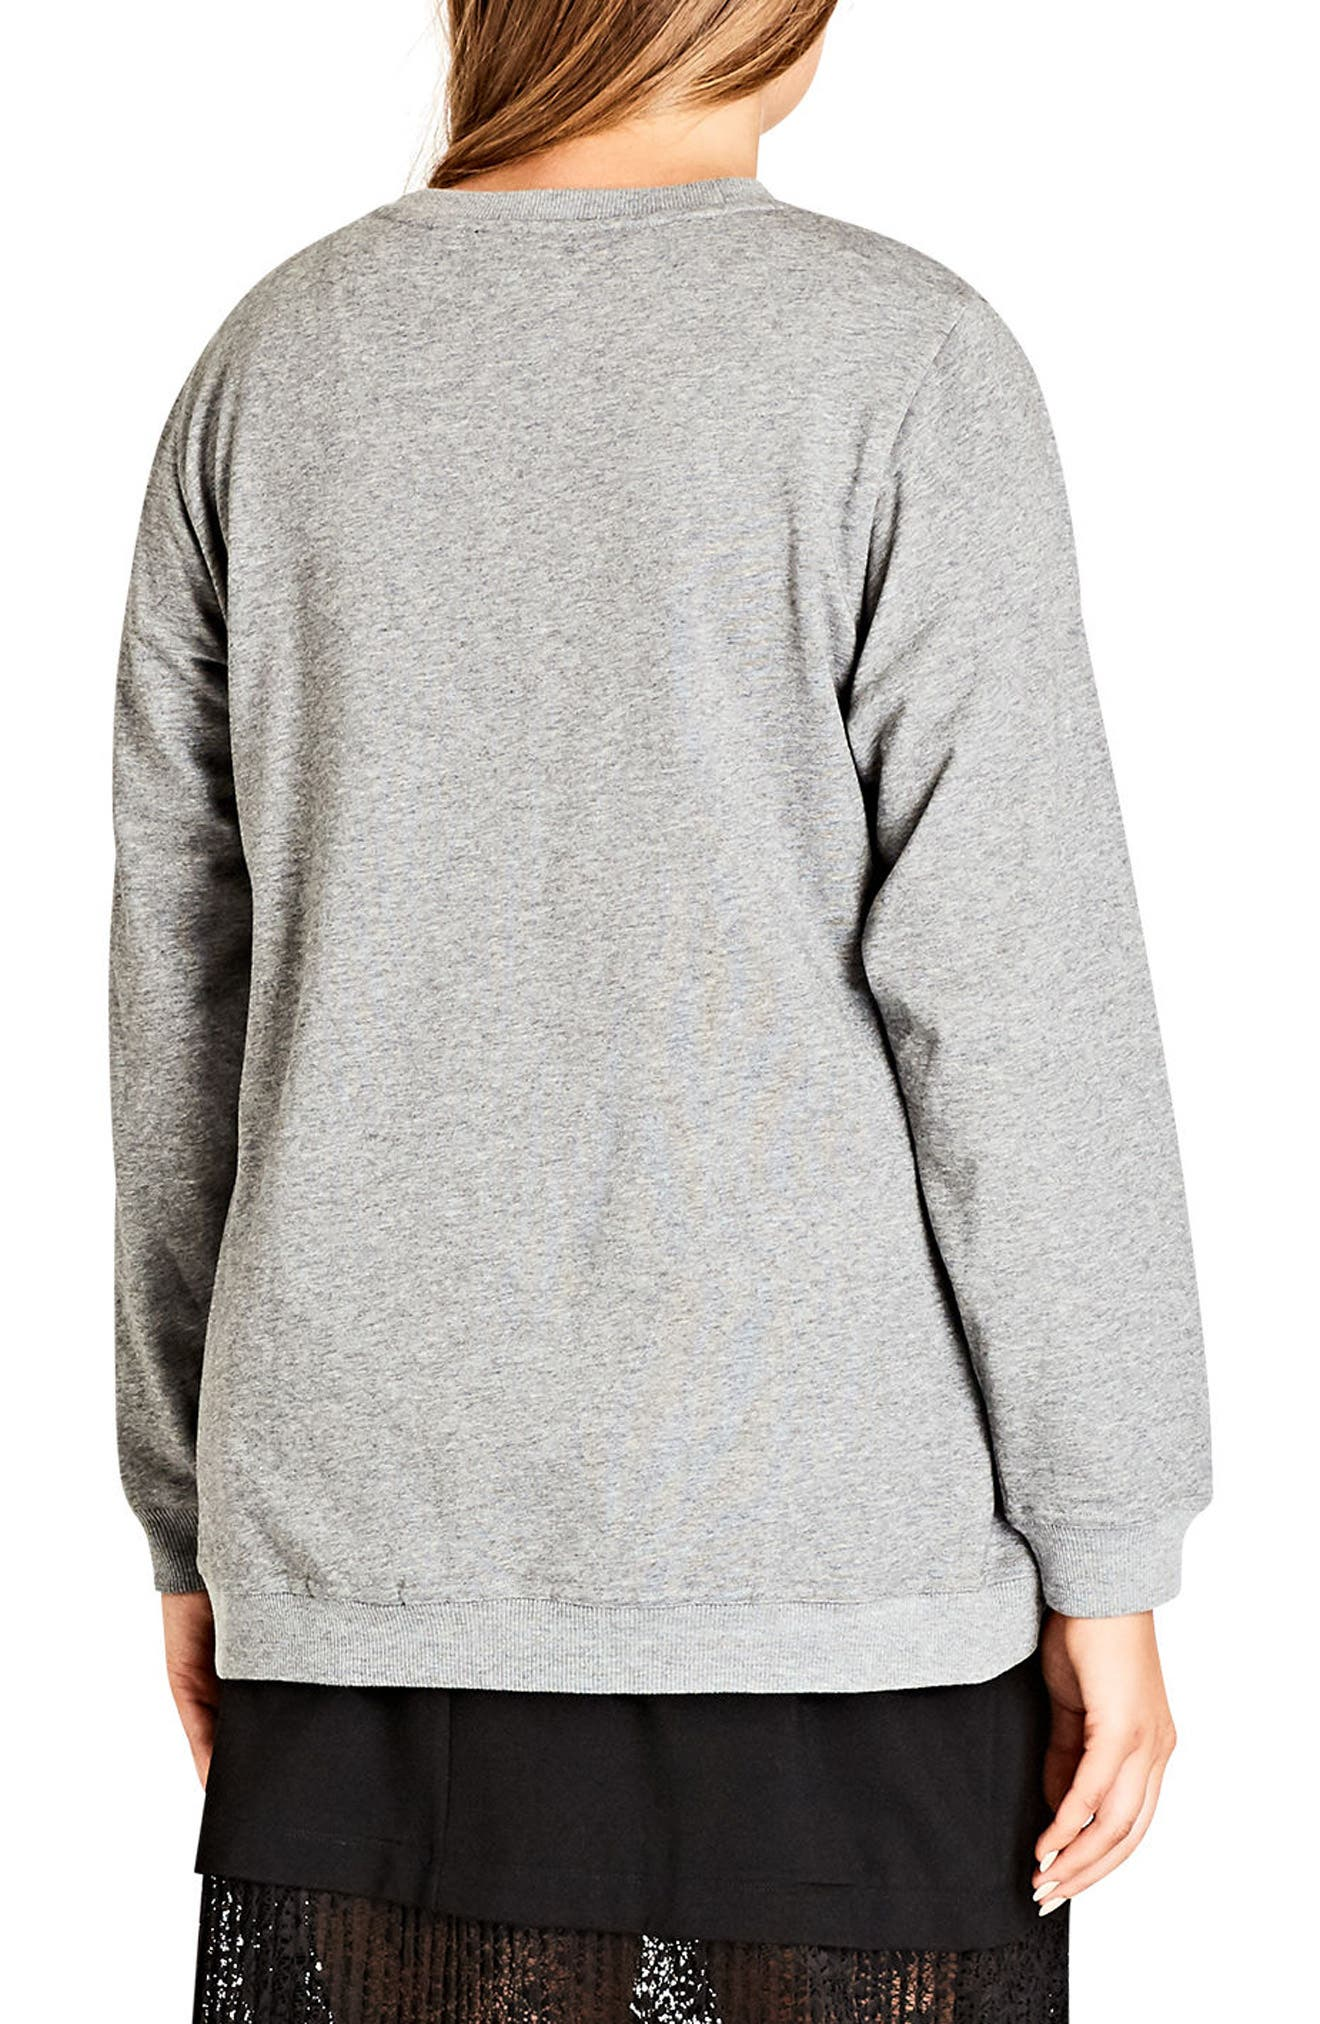 Alternate Image 2  - City Chic Vibes Glitter Graphic Sweatshirt (Plus Size)